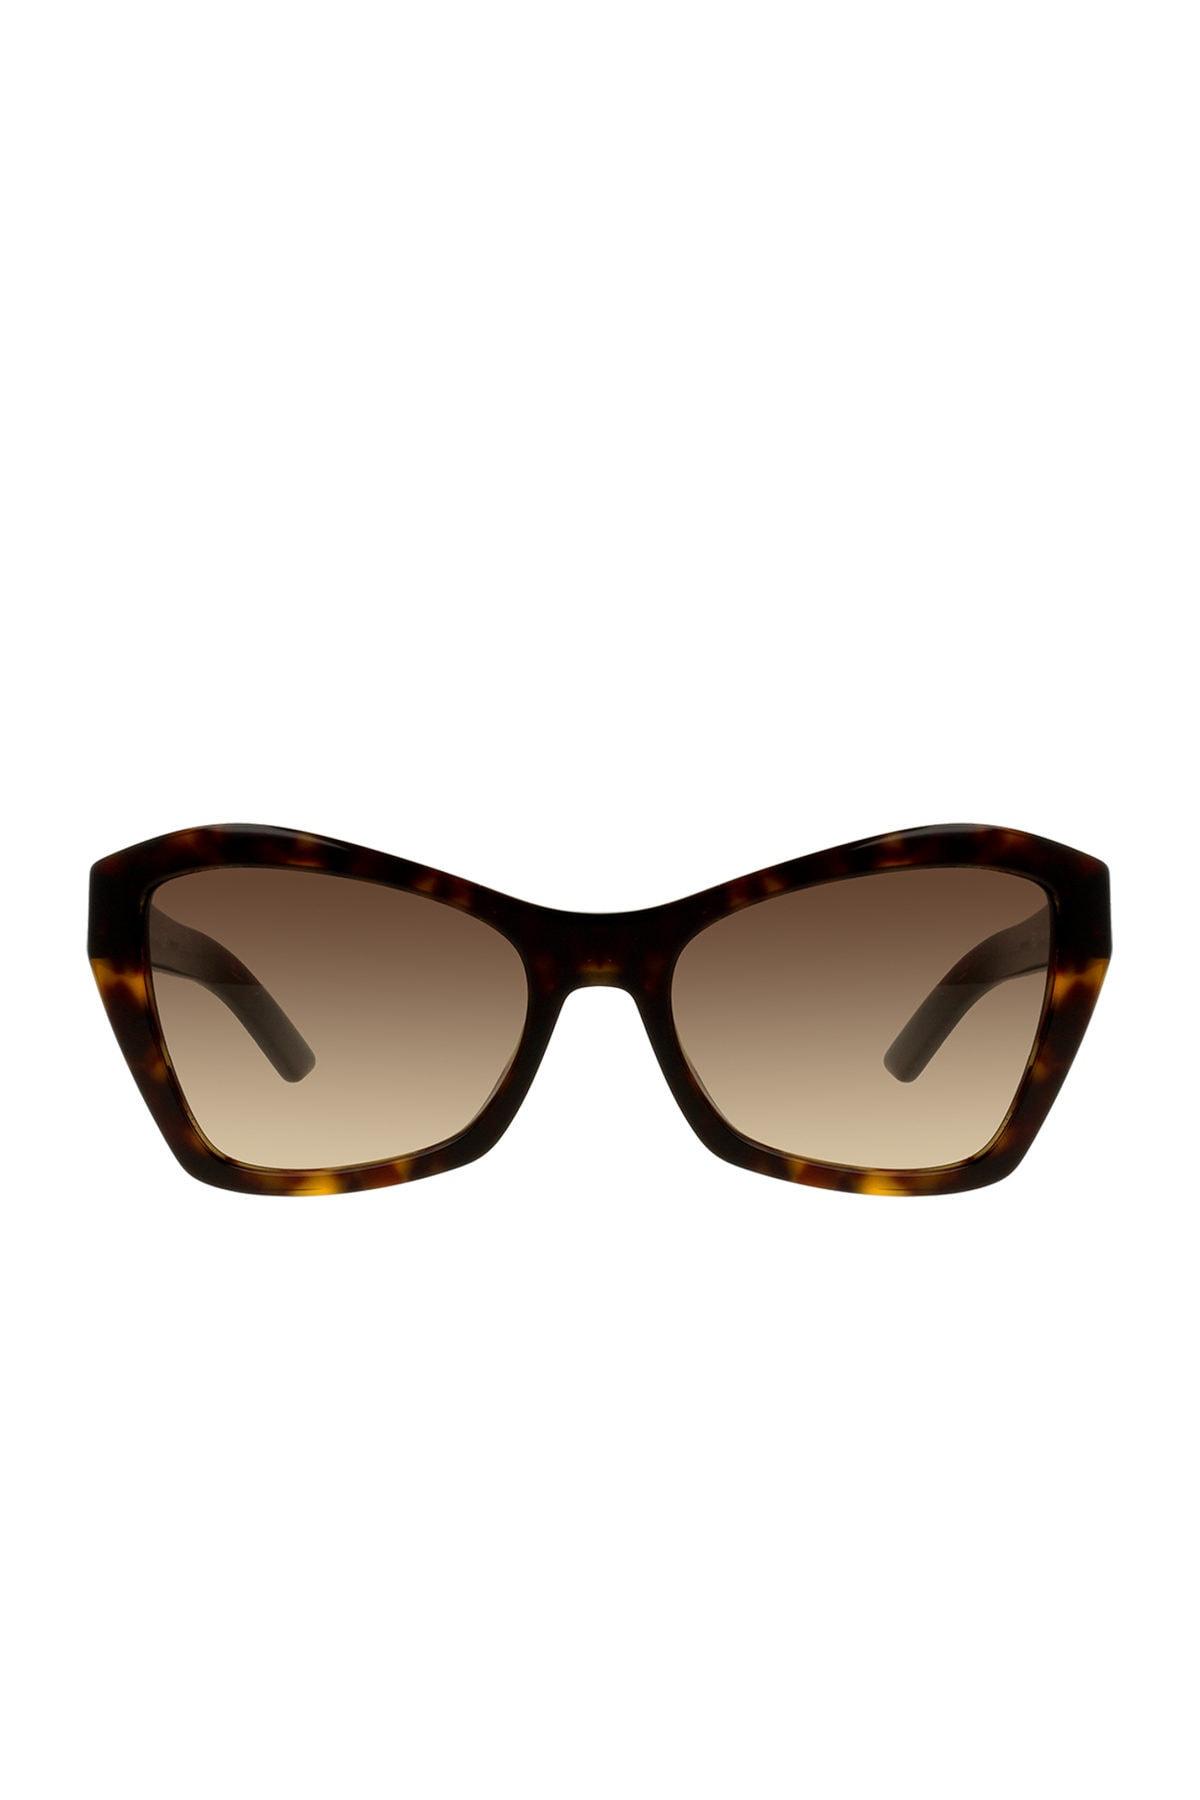 عینک آفتابی  برند Prada رنگ بژ کد ty36899890